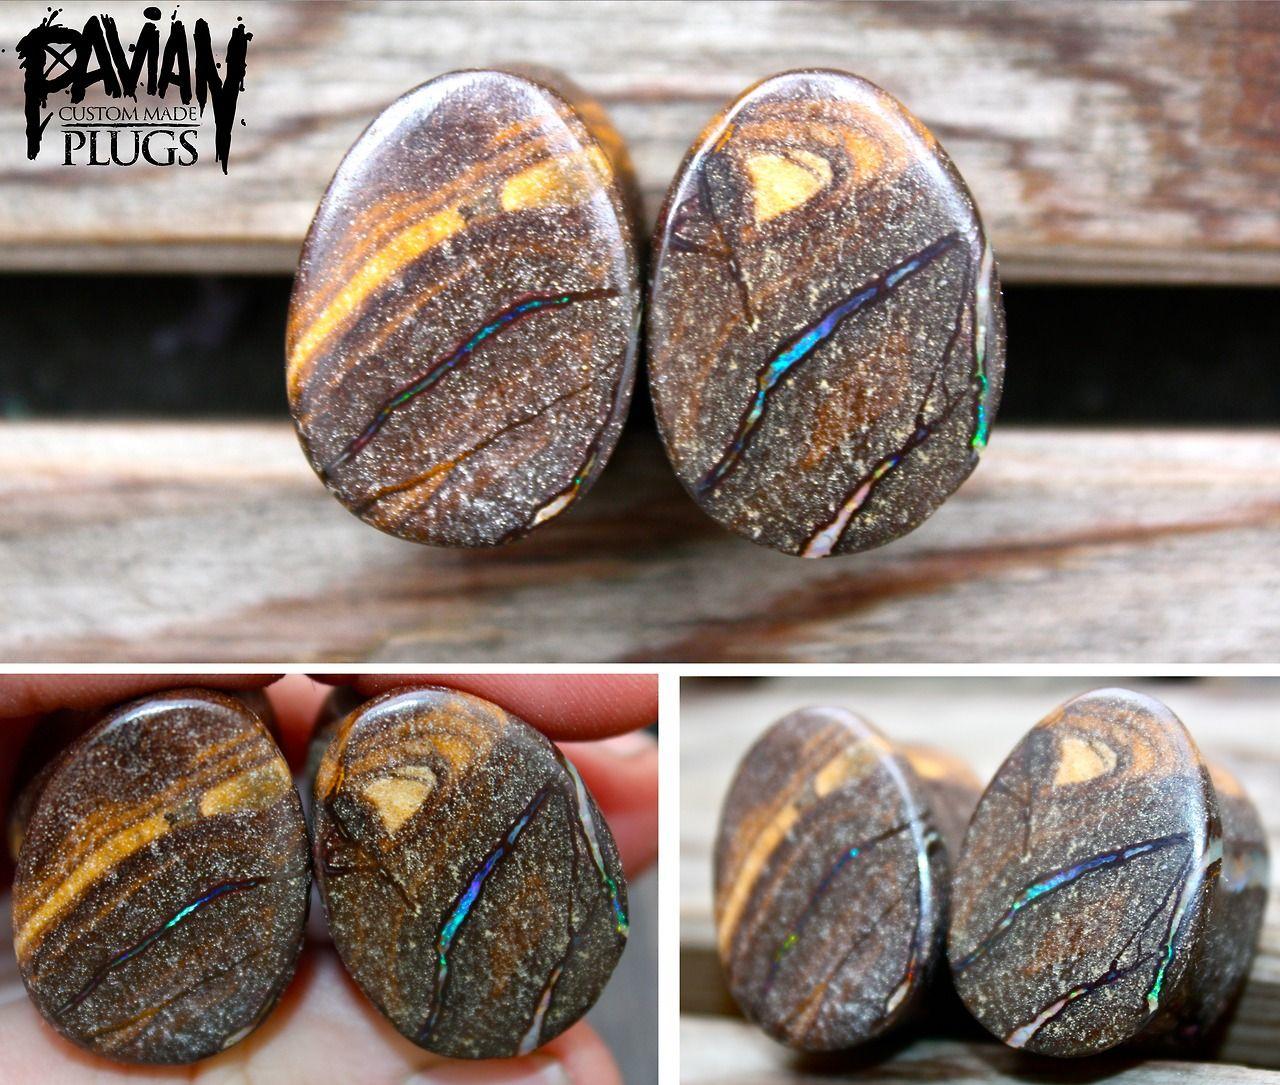 pavianplugsorganics: 20mm boulder opal teardrop plugs ...